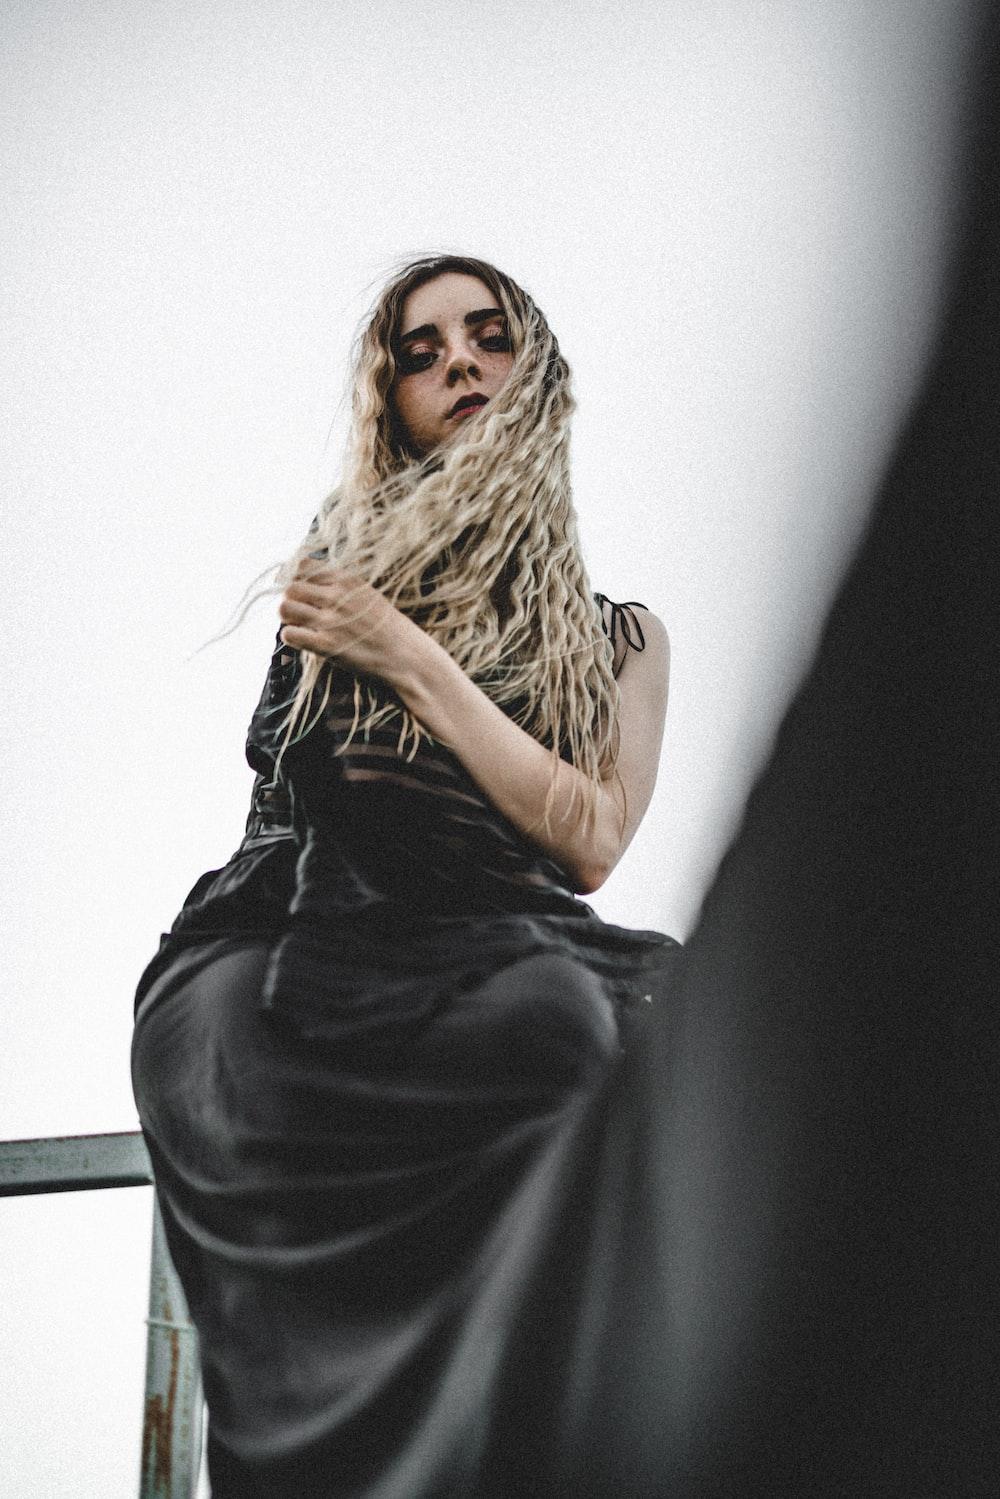 woman wearing black sleeveless dress sitting on railings while looking down